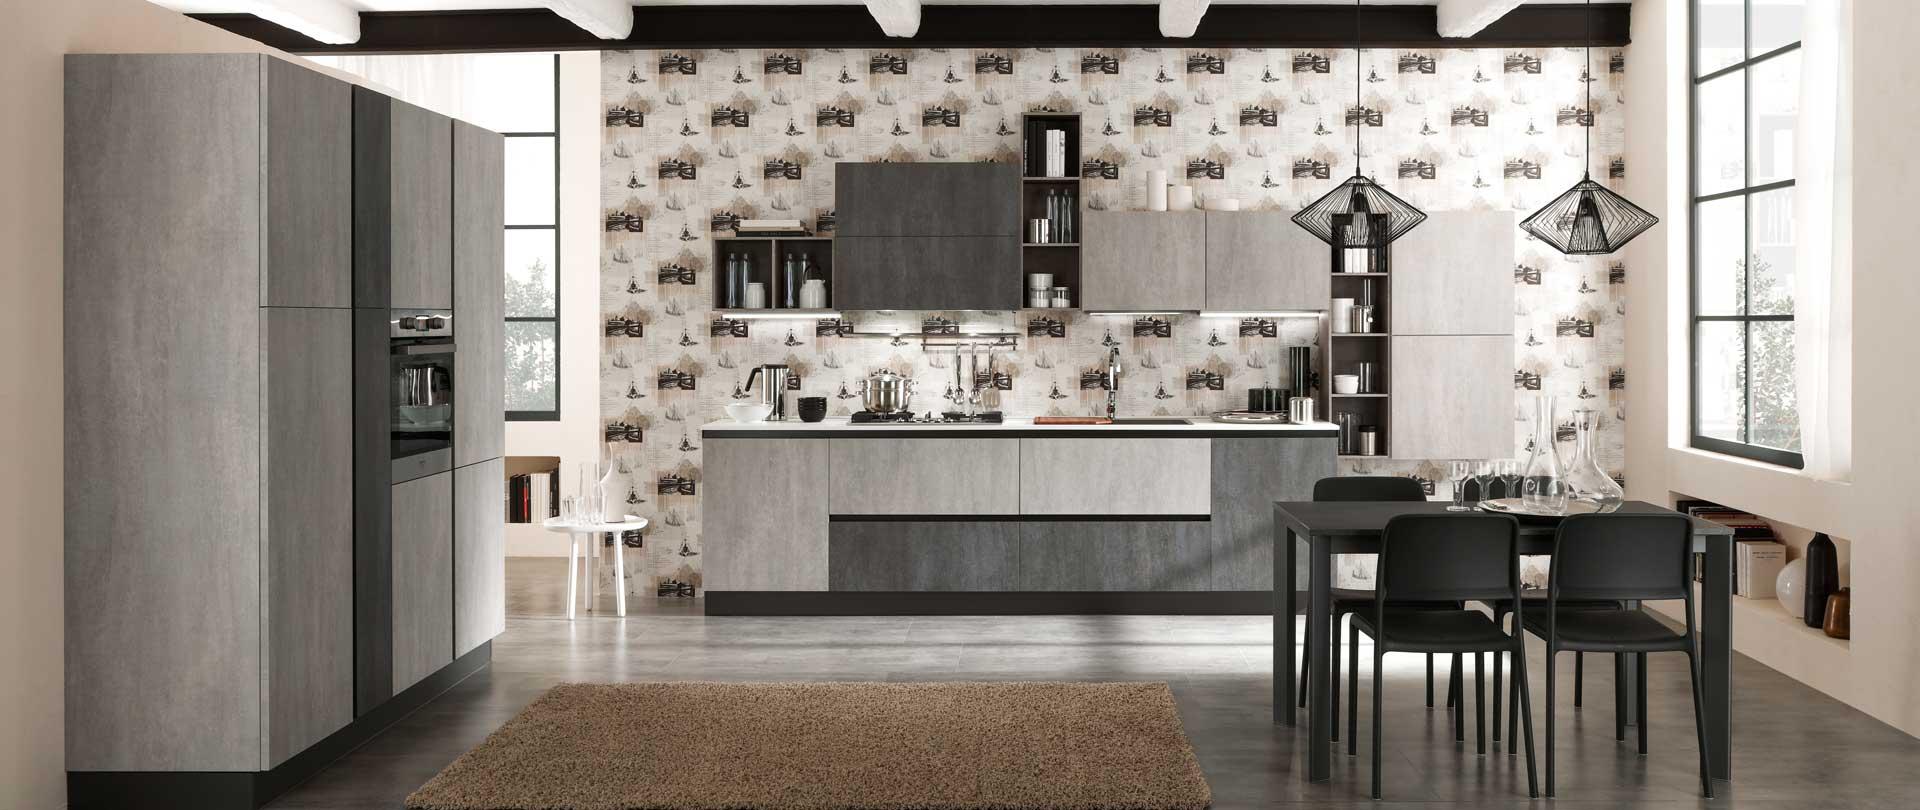 cucina zen mobilturi | tutto mobili, arredamento camere cucine ... - Arredamento Zen Roma